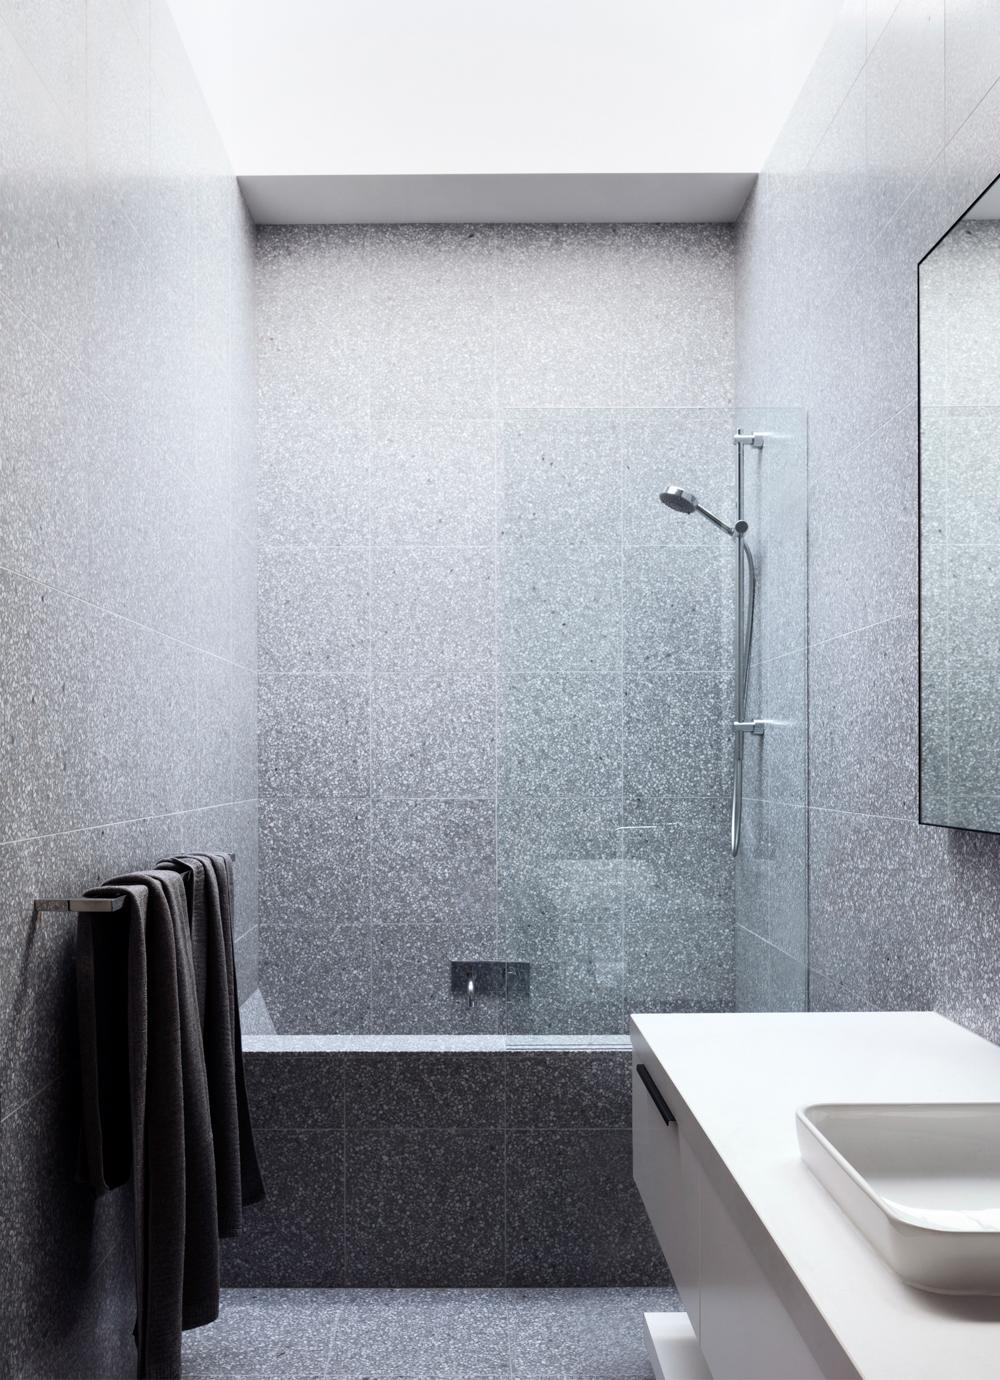 Bathroom Design and architecture